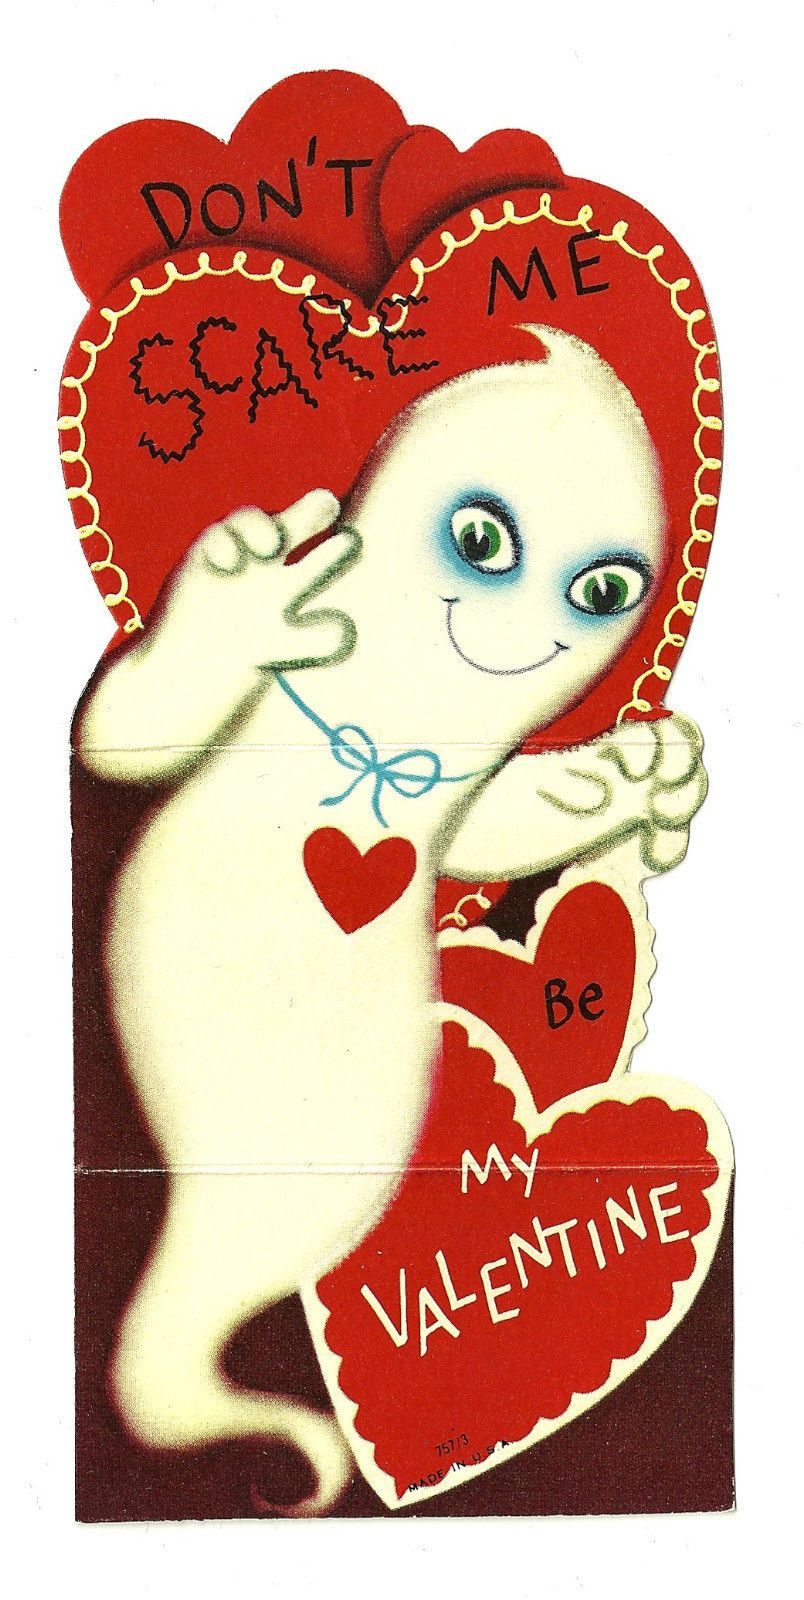 Vintage Valentine Card  eBay  Be my valentine  Pinterest